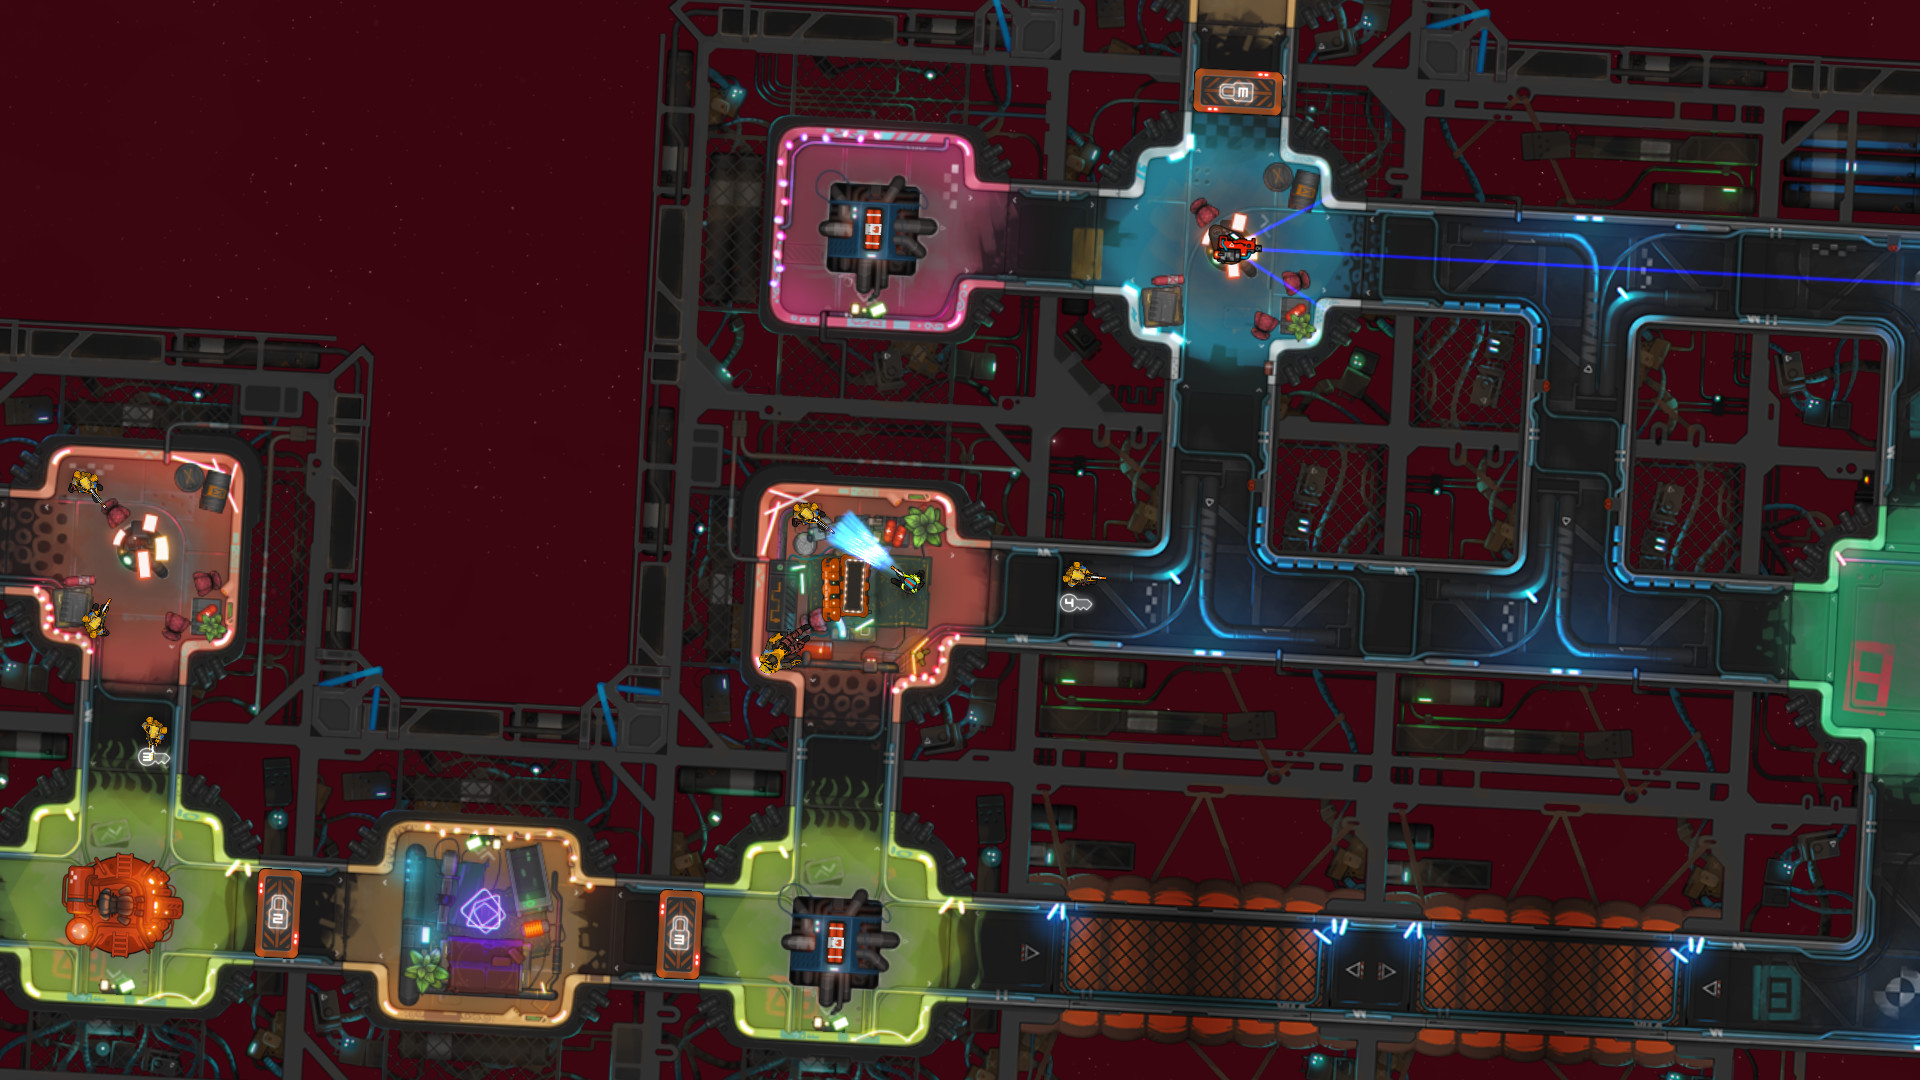 Gamasutra: Fabian Fischer's Blog - Spatiality in Game Design